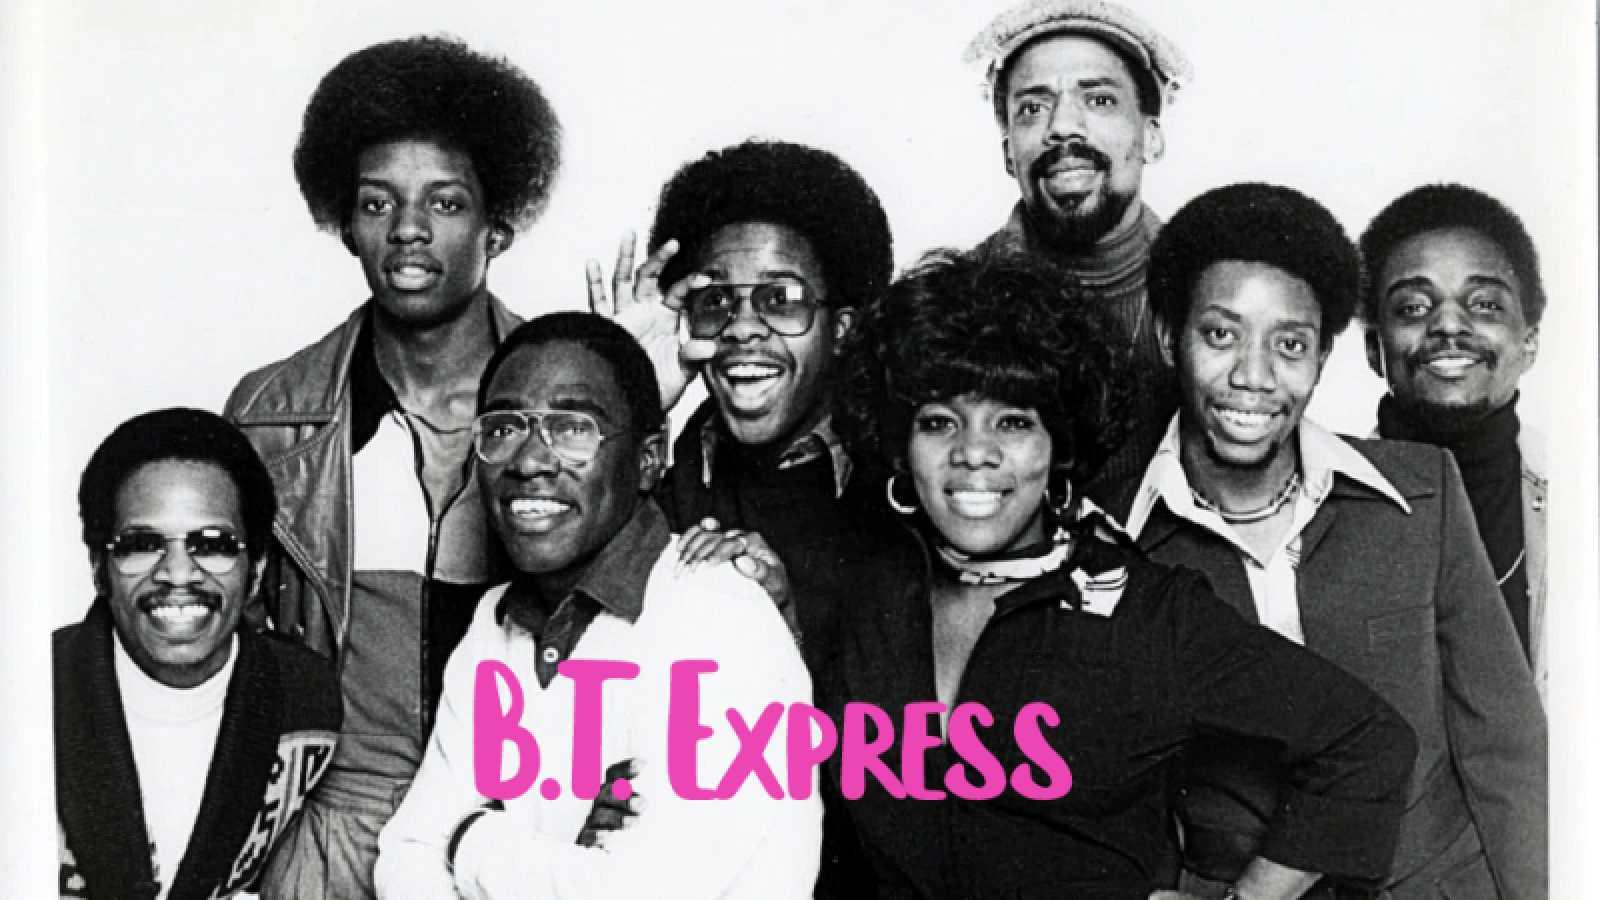 Próxima parada - Funky: People's Choice, Cameo, B.T. Express & Hot Chocolate - 04/09/20 - escuchar ahora